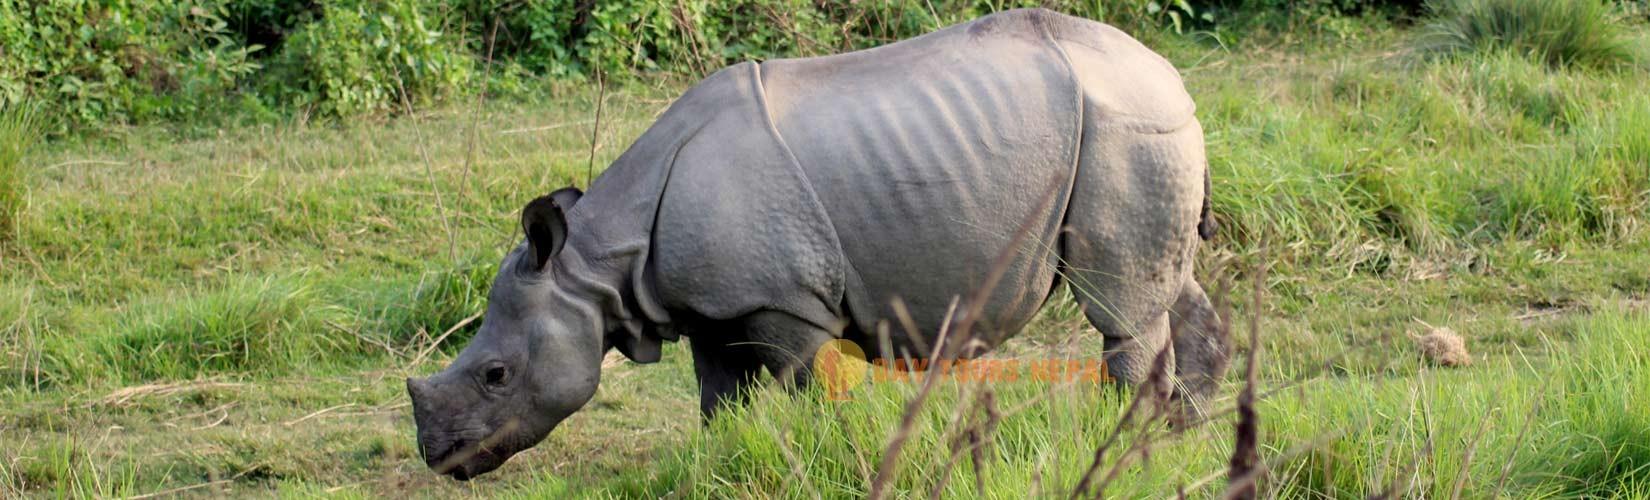 jungle safari bardia national park